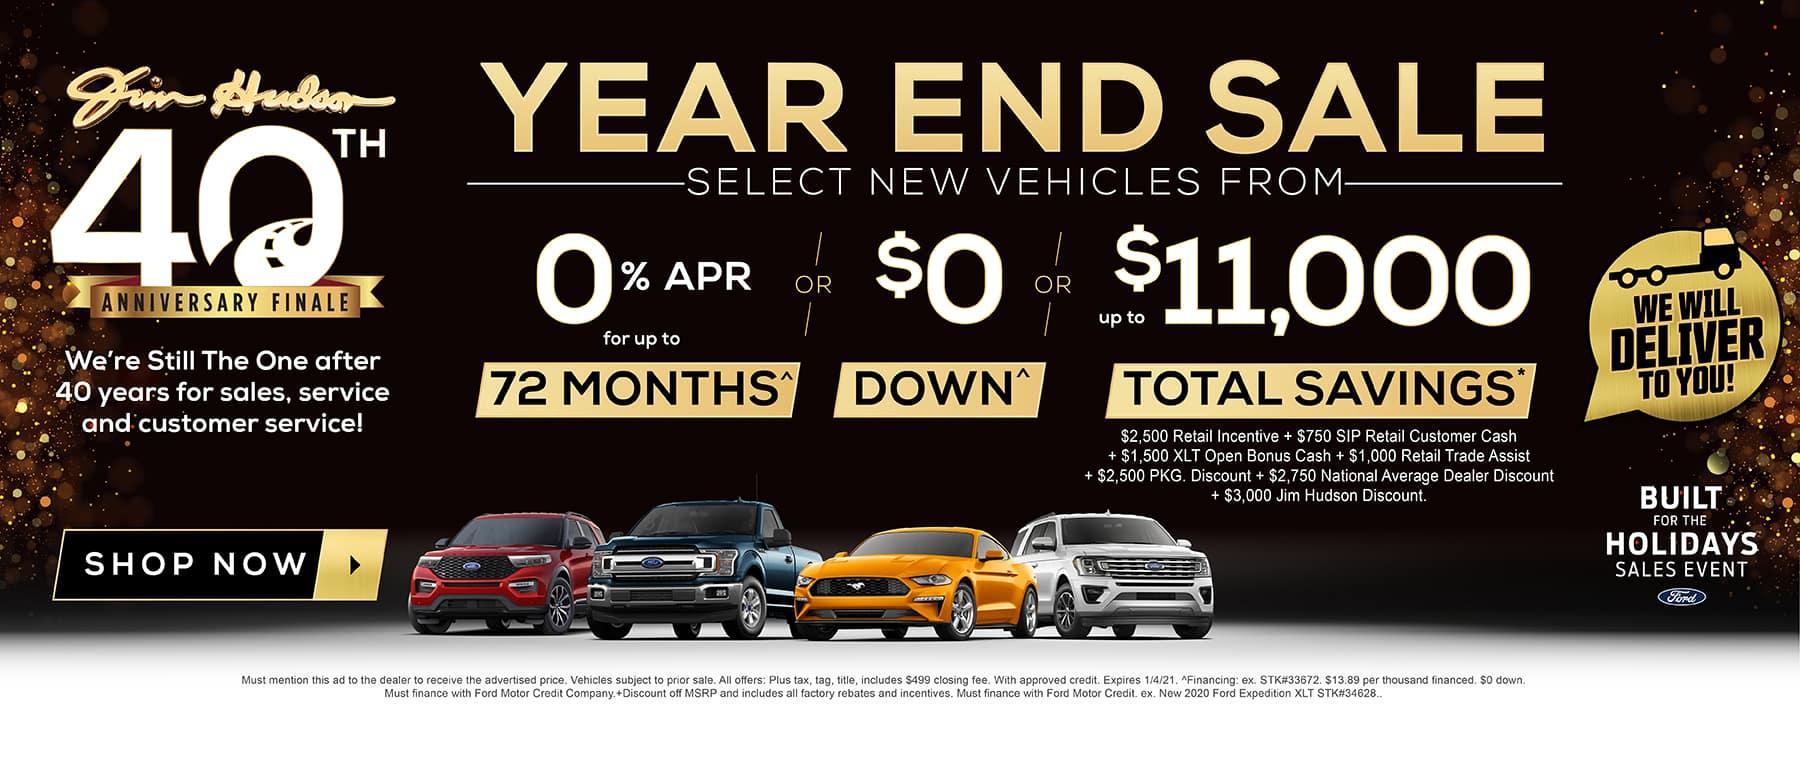 JHF - Year End Sale